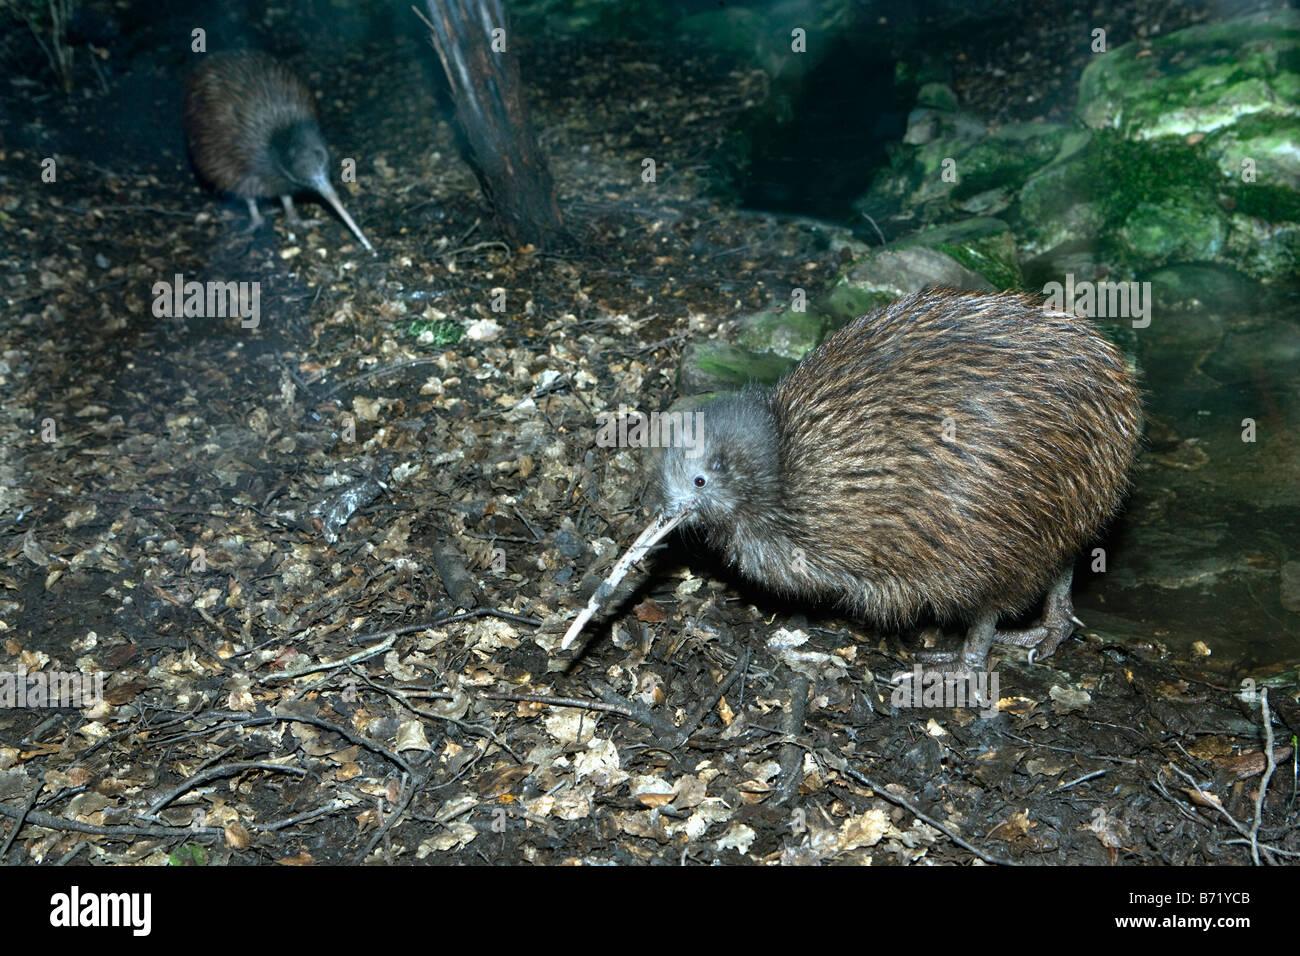 New Zealand, South Island, Queenstown, Kiwi, Apteryx australis. - Stock Image